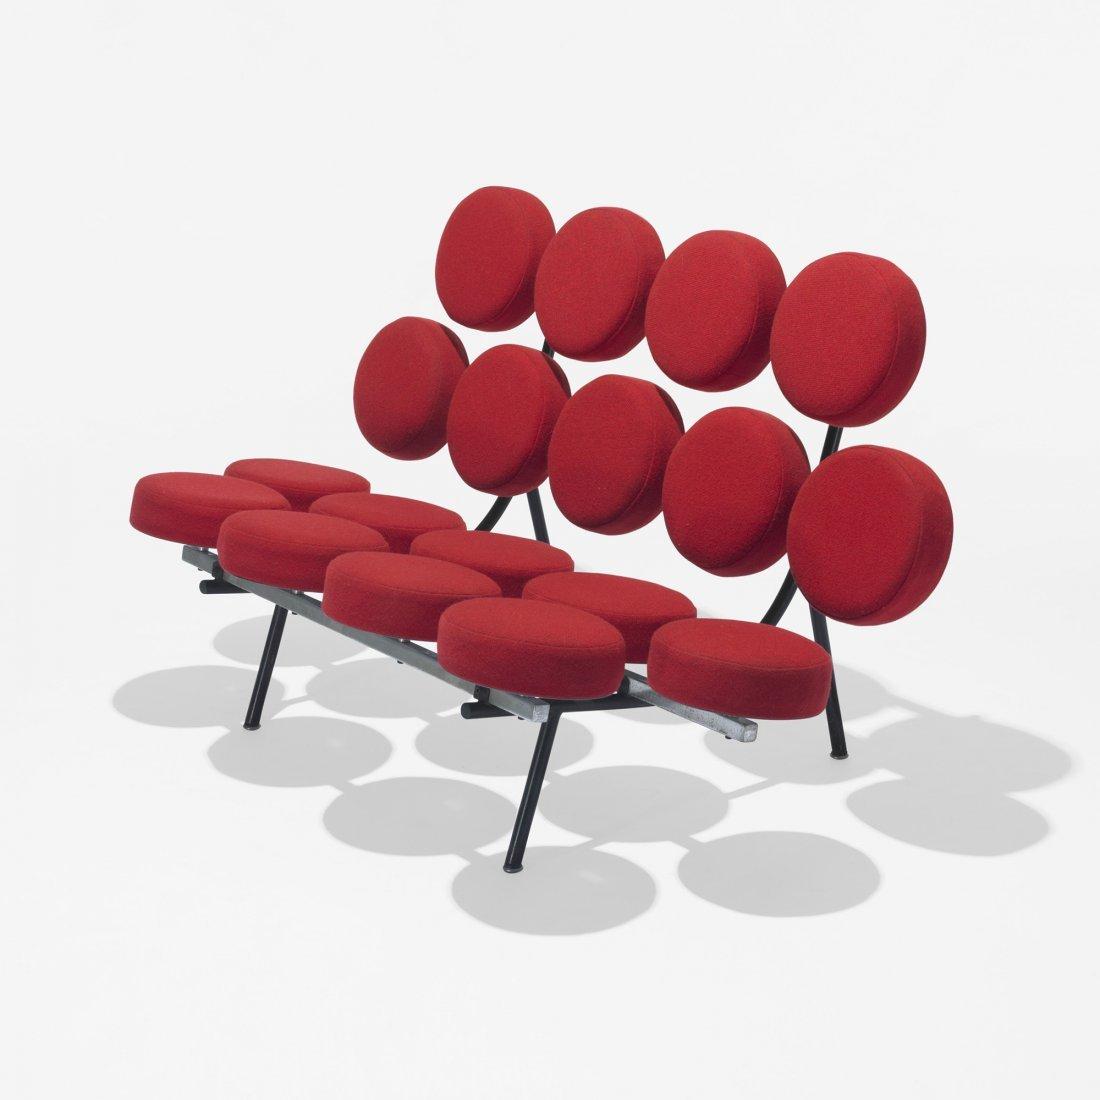 102: George Nelson & Associates Marshmallow sofa